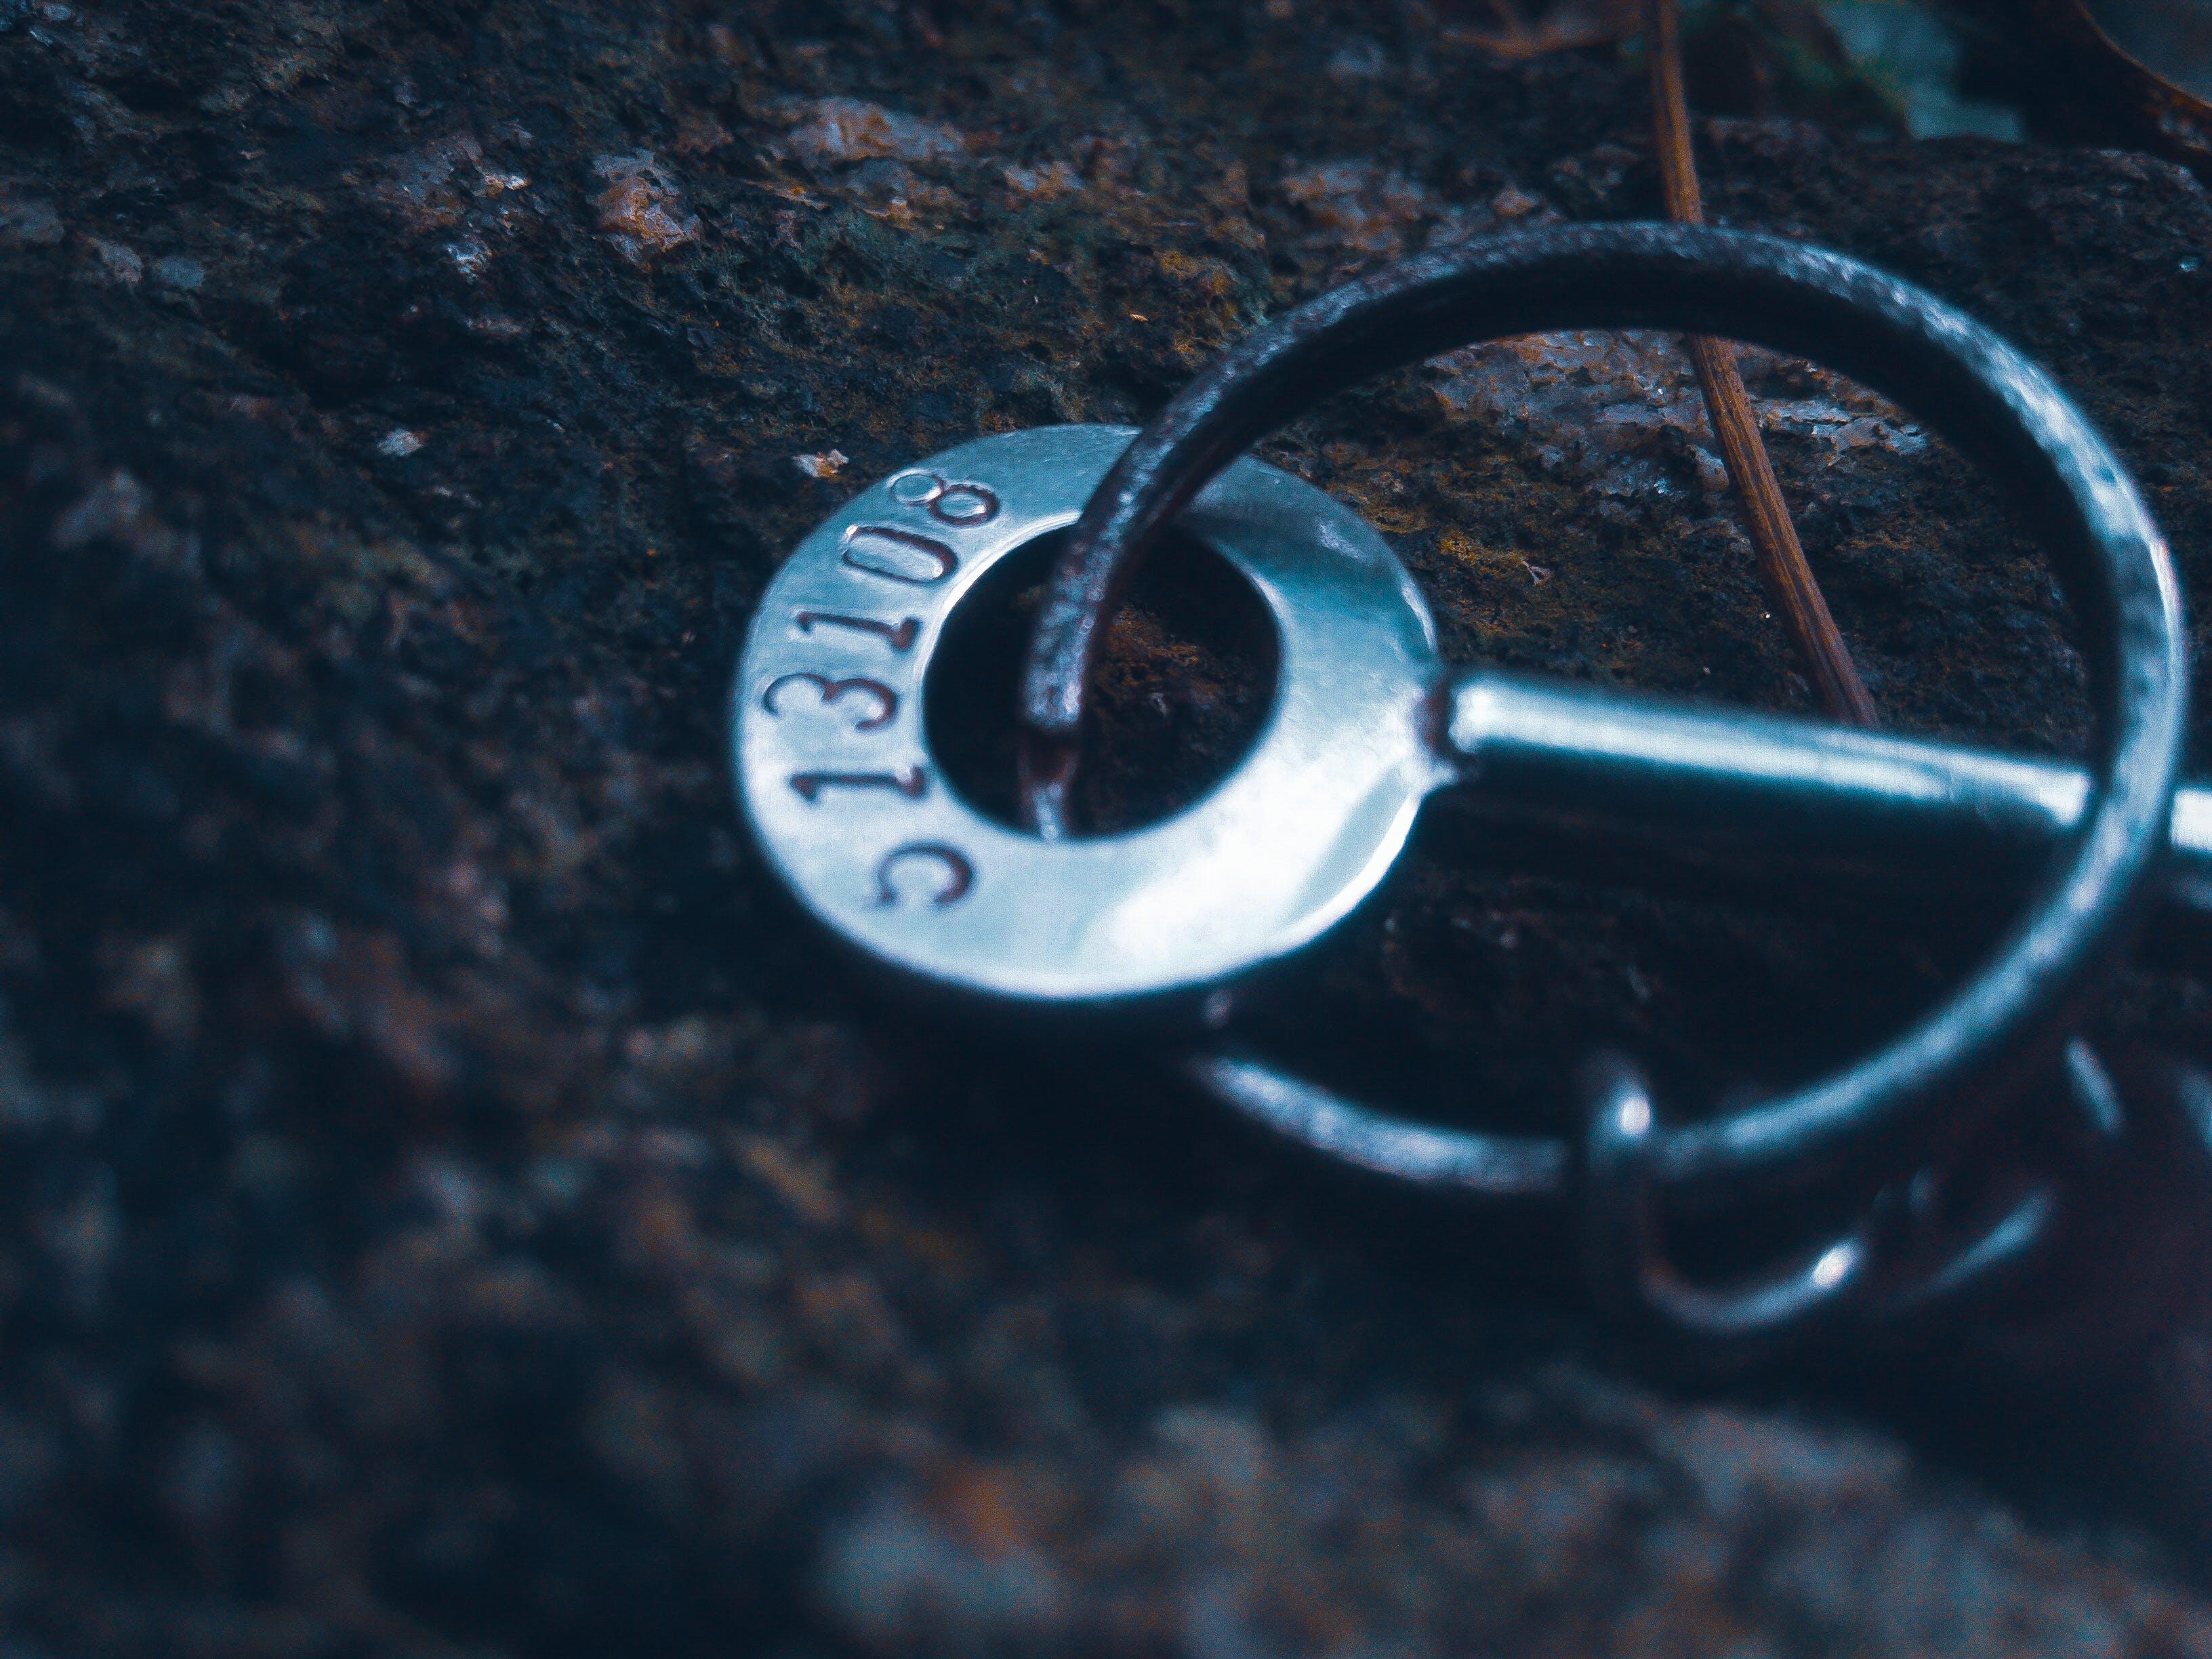 Skeleton Key on Ground